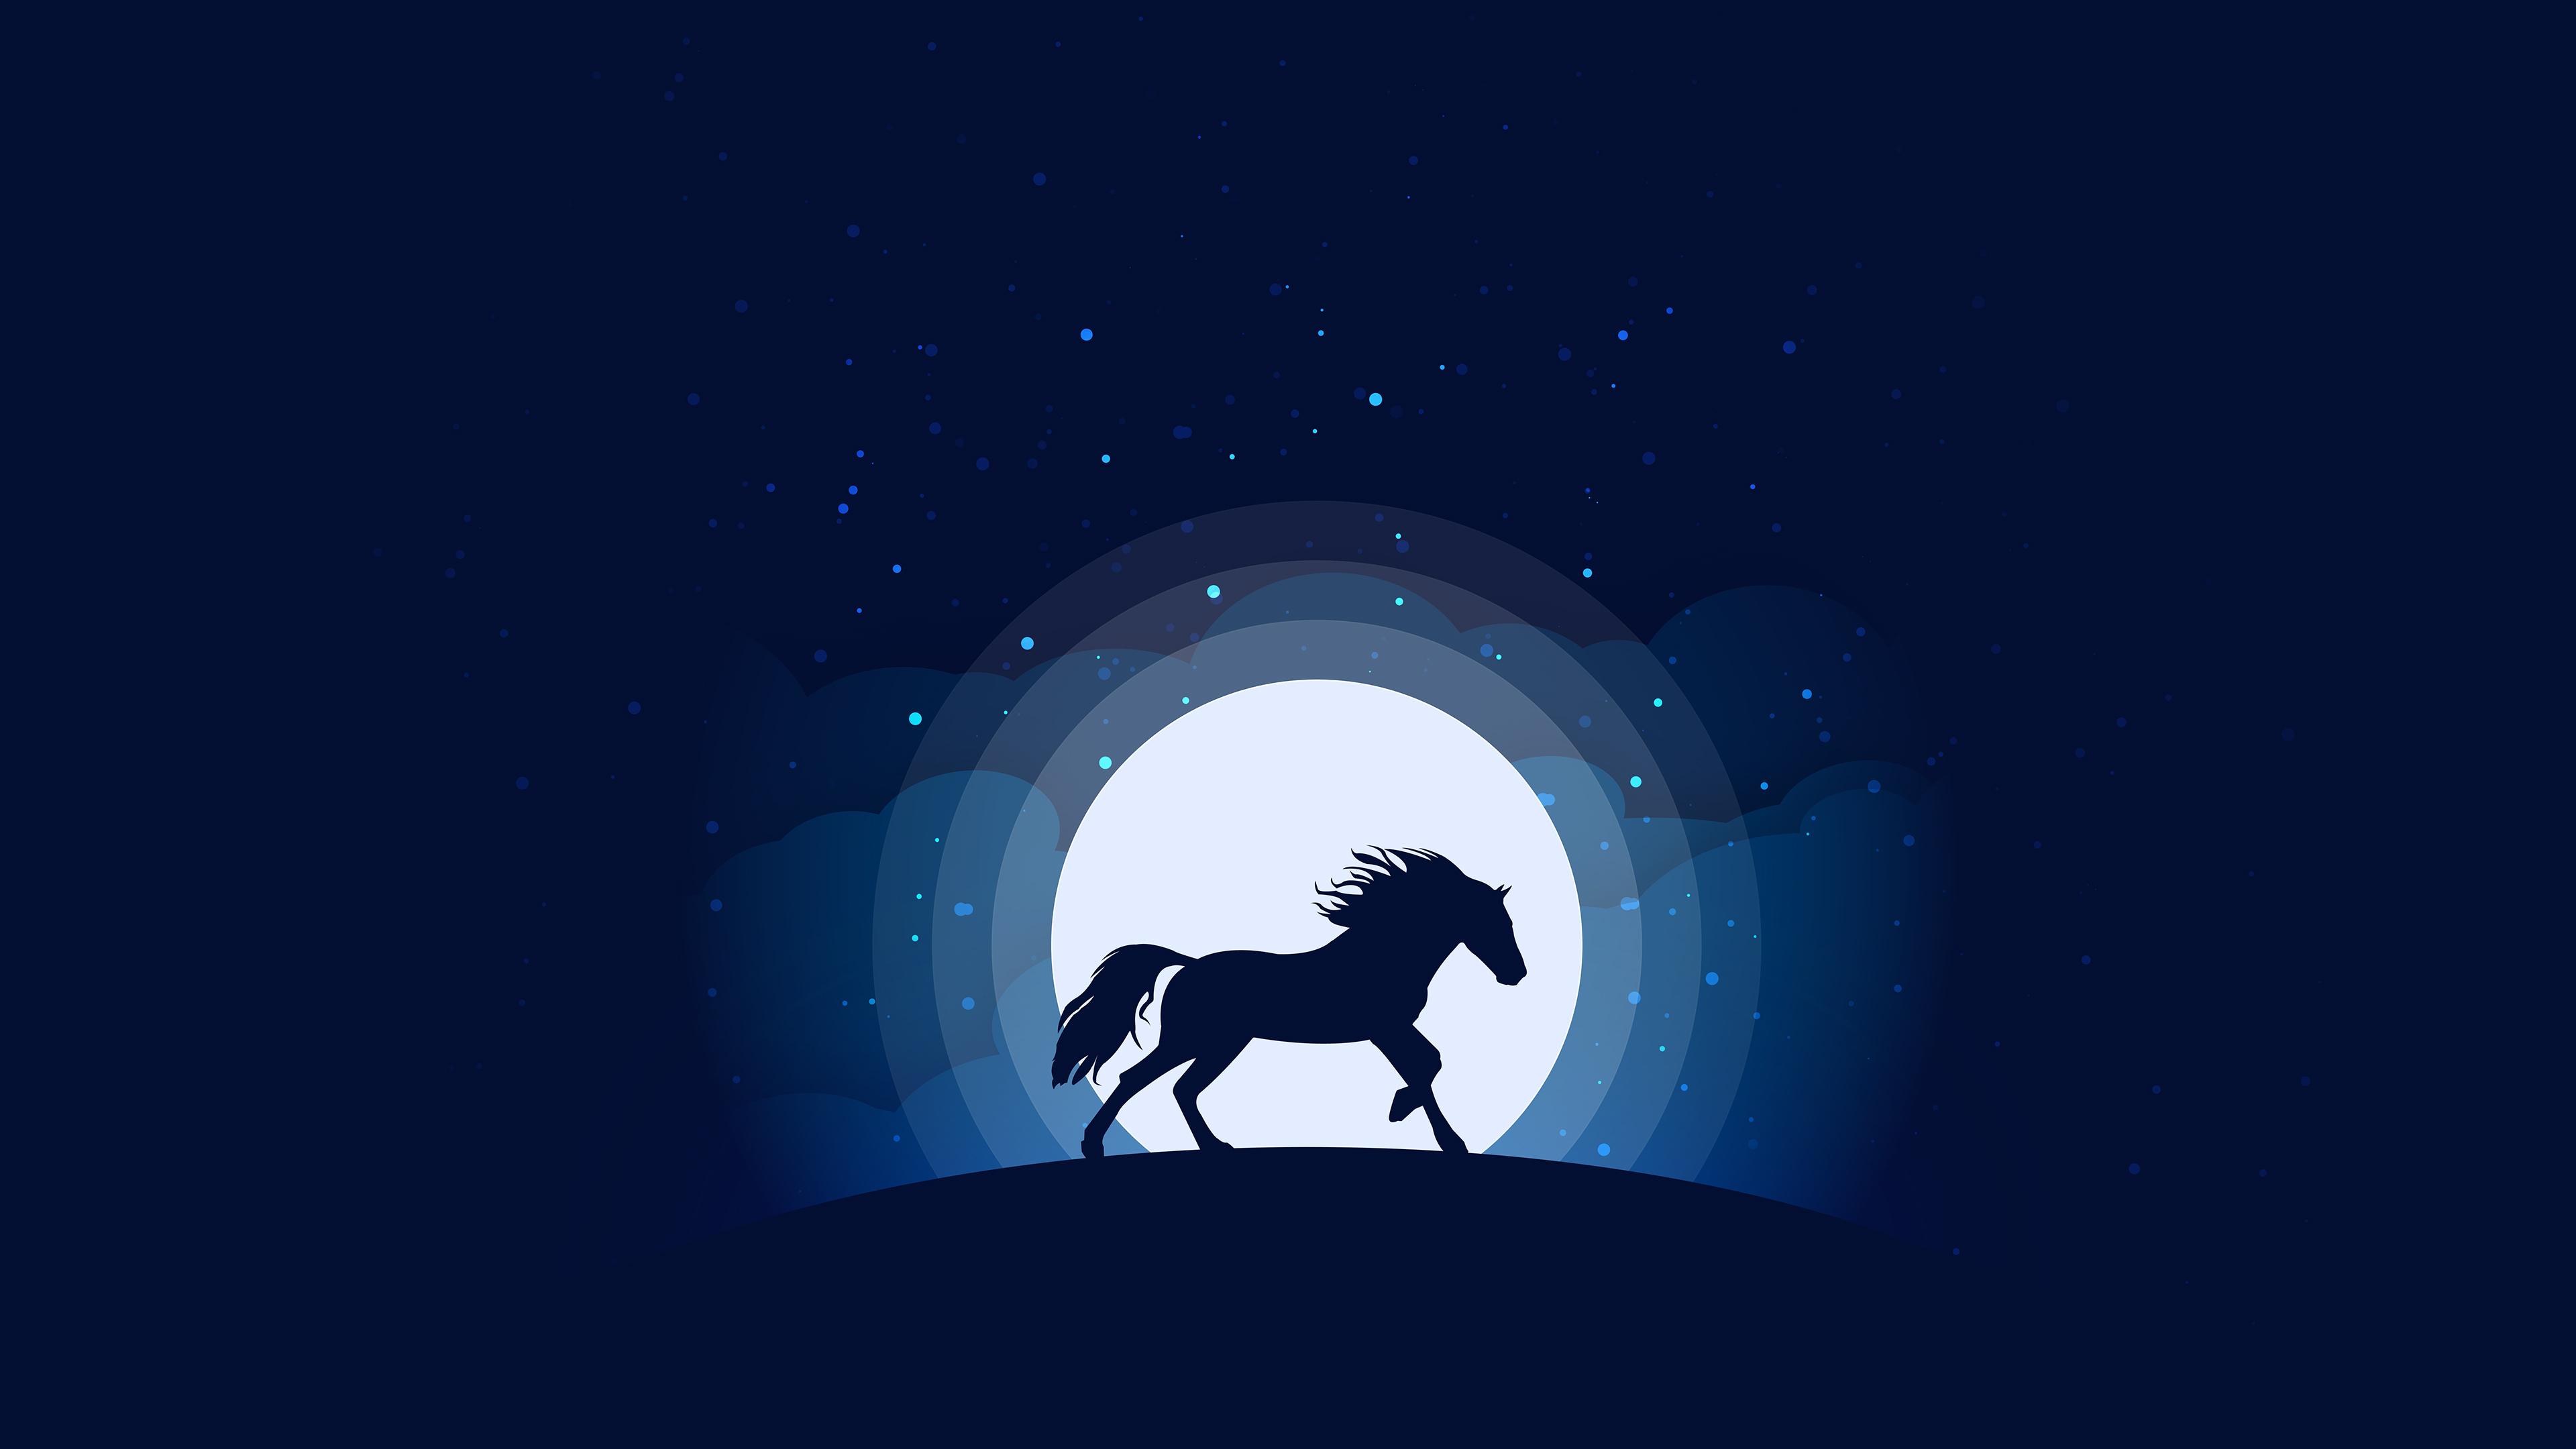 horse silhouette digital art 4k 1546279466 - Horse Silhouette Digital Art 4k - silhouette wallpapers, horse wallpapers, hd-wallpapers, digital art wallpapers, behance wallpapers, artwork wallpapers, artist wallpapers, animals wallpapers